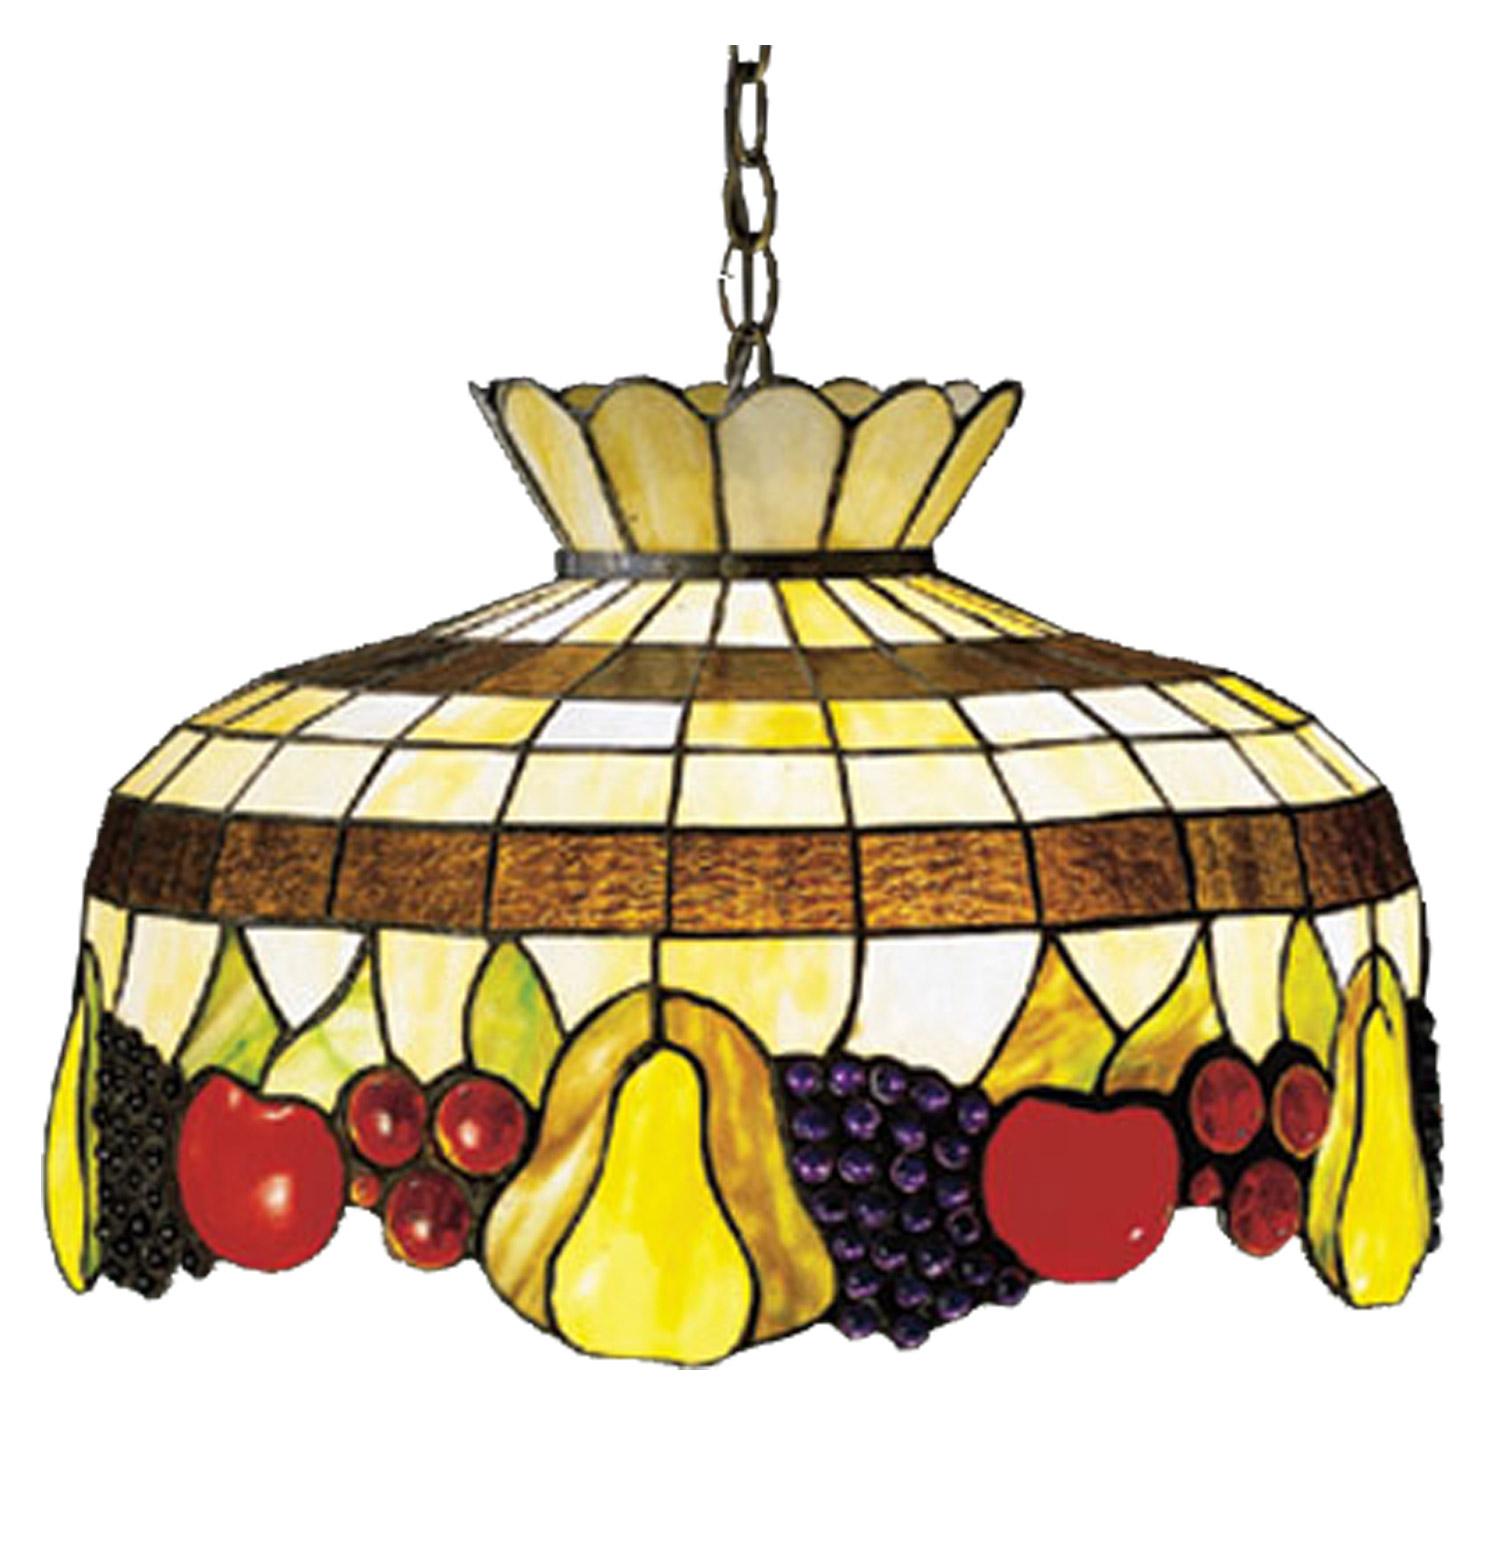 Meyda 26624 Tiffany Fruit Pendant